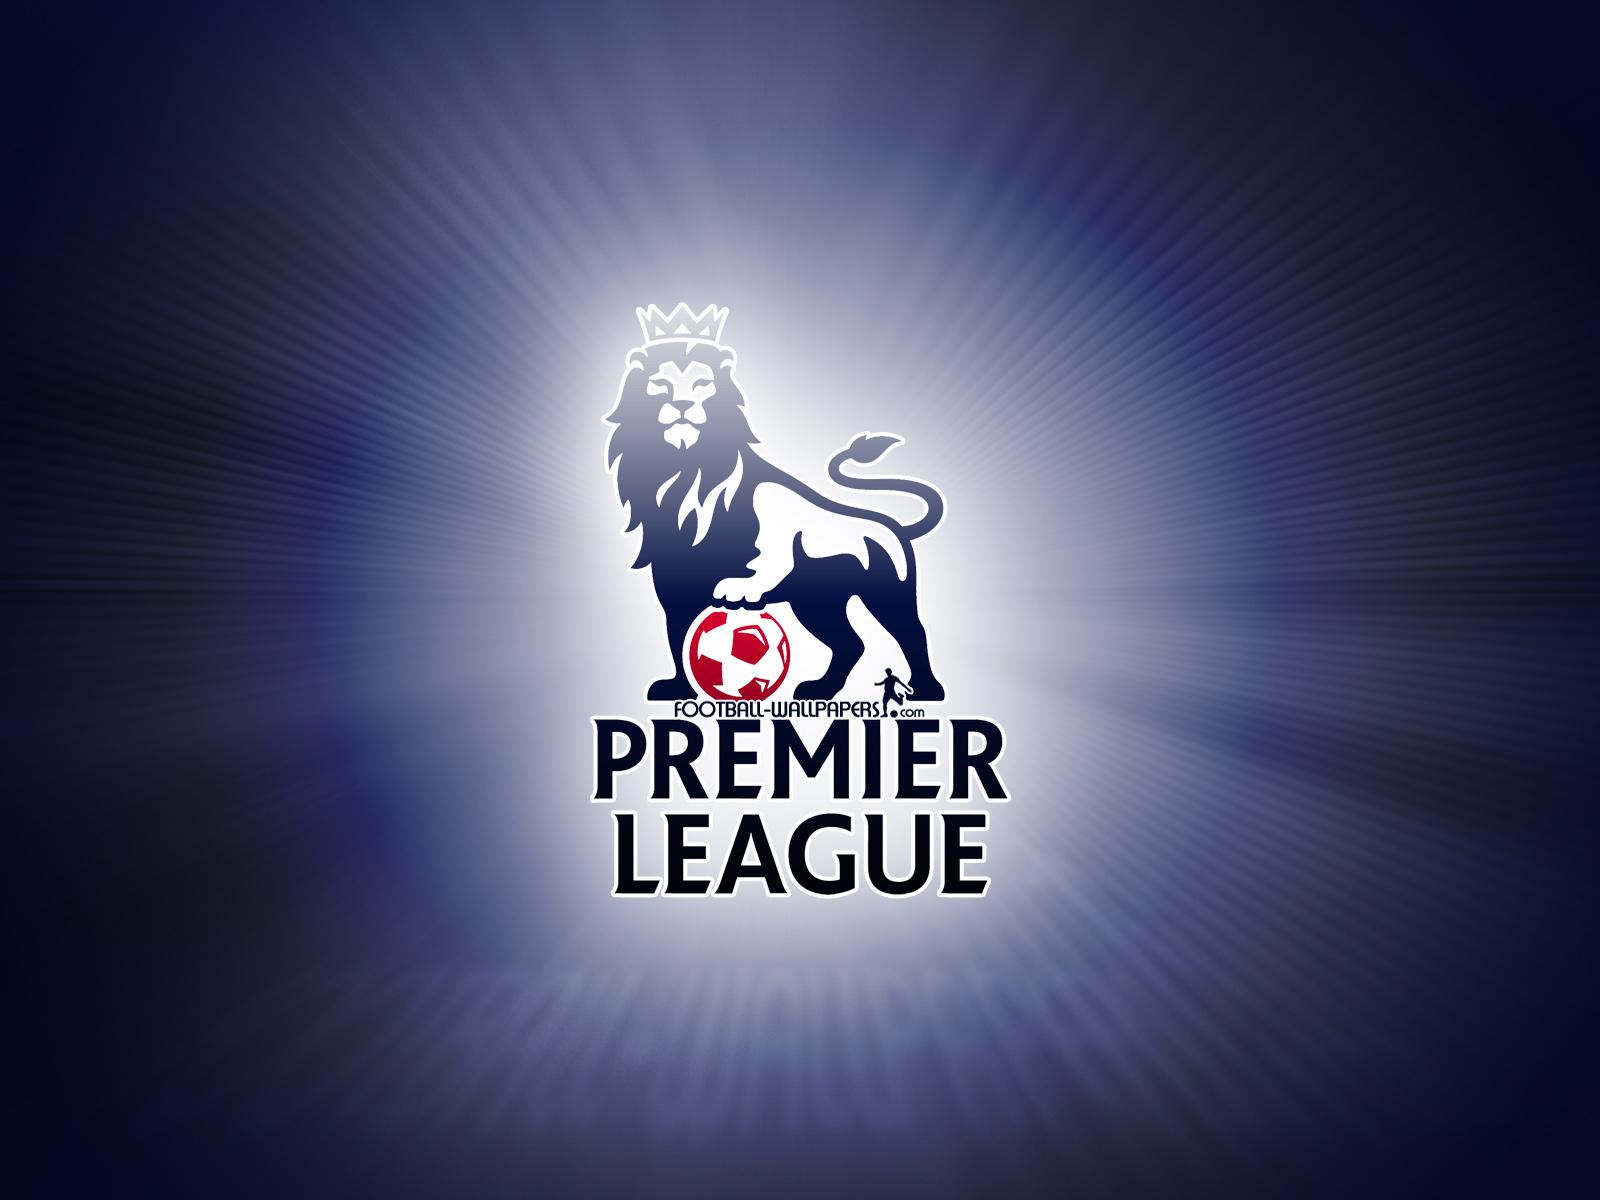 Chelsea Calendario.Premier League Manchester Chelsea Gia Alla Seconda Ecco